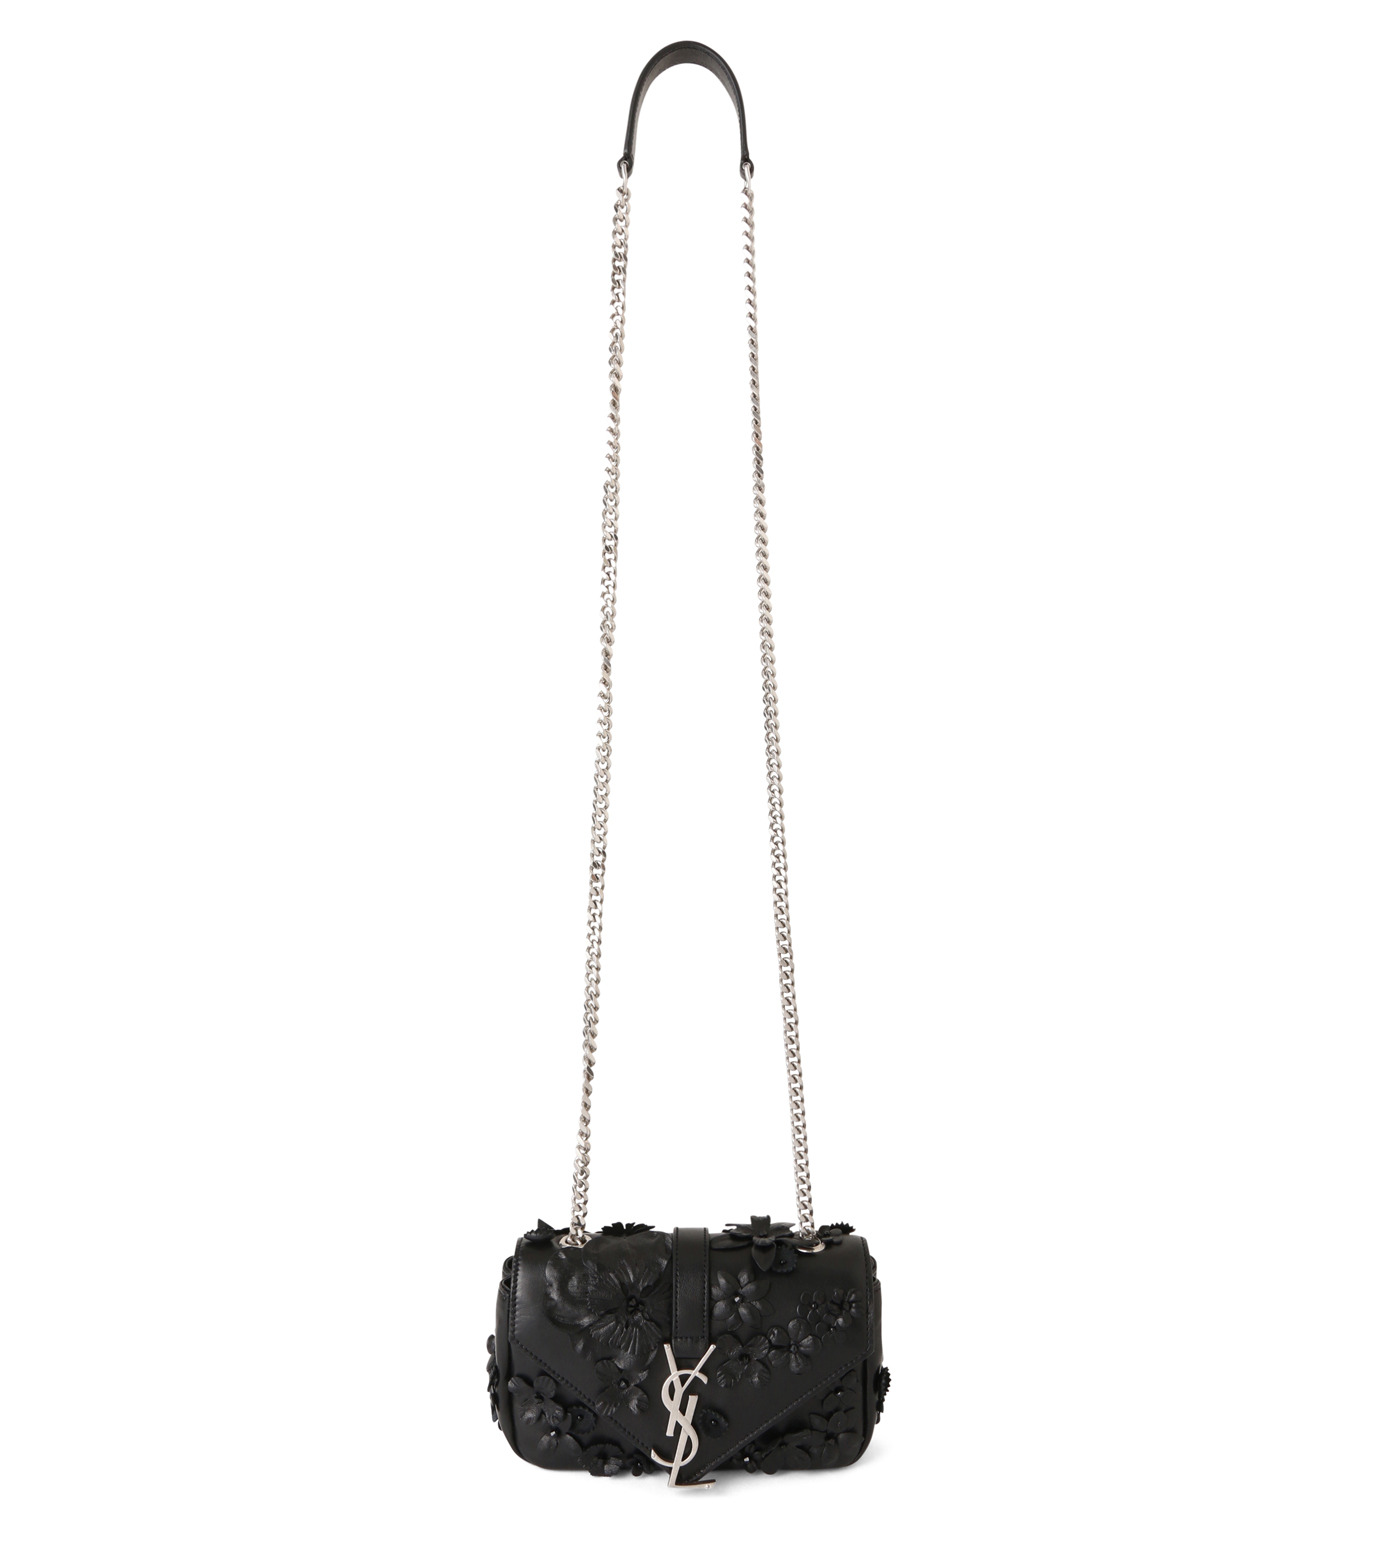 SAINT LAURENT(サンローラン)のMonogramme Baby Chain Emb Flowers-BLACK(ショルダーバッグ/shoulder bag)-399289-BL4U6-13 拡大詳細画像1